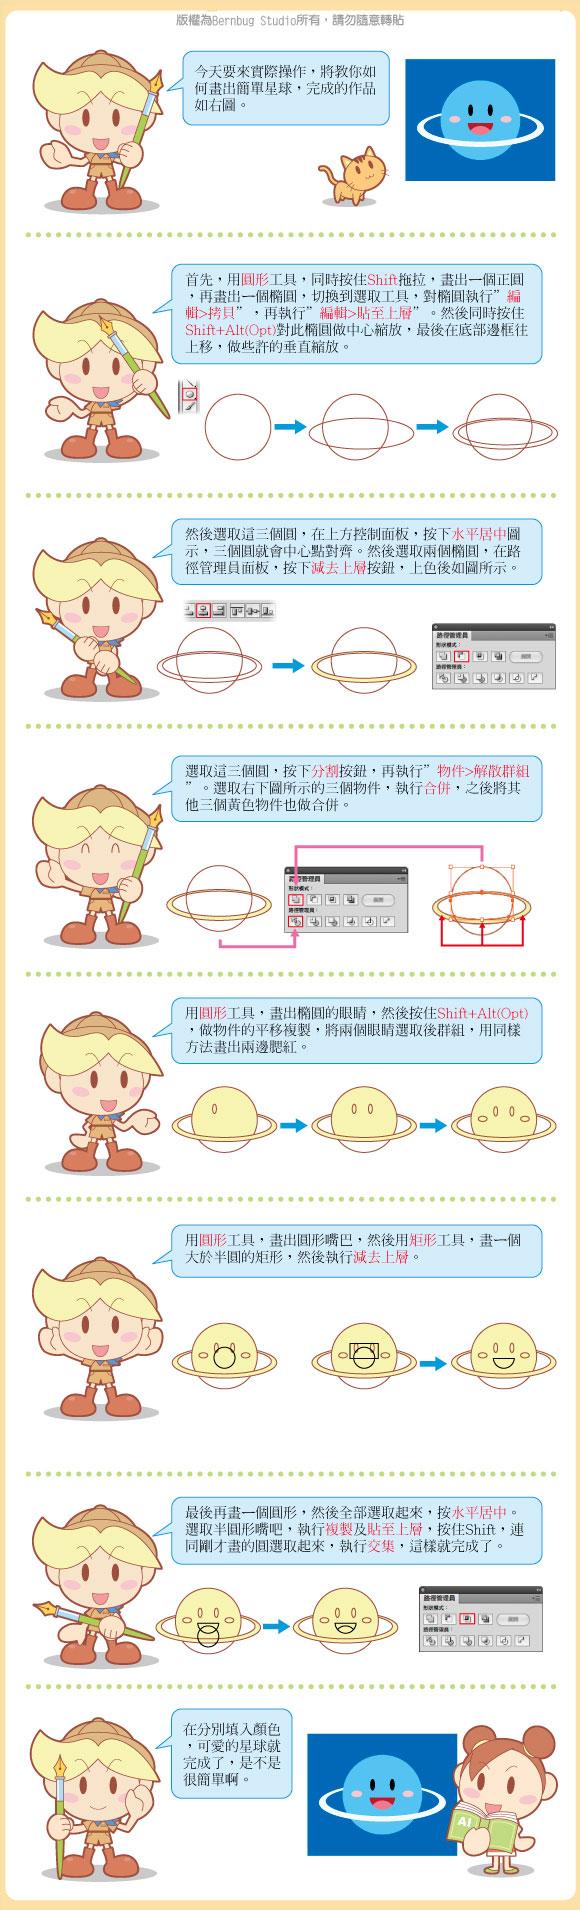 lesson5.jpg